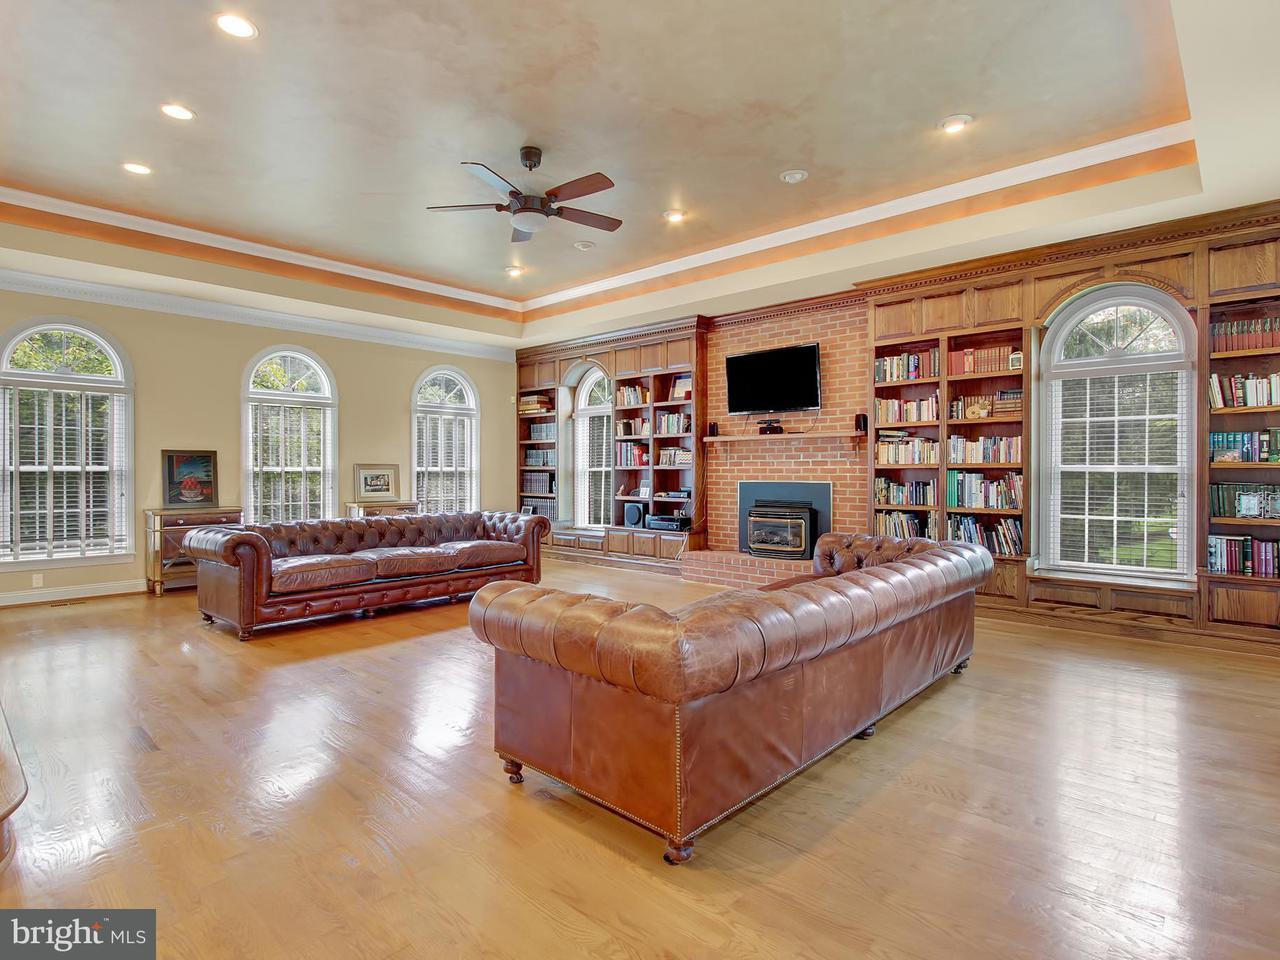 獨棟家庭住宅 為 出售 在 1420 Tayside Way 1420 Tayside Way Bel Air, 馬里蘭州 21015 美國